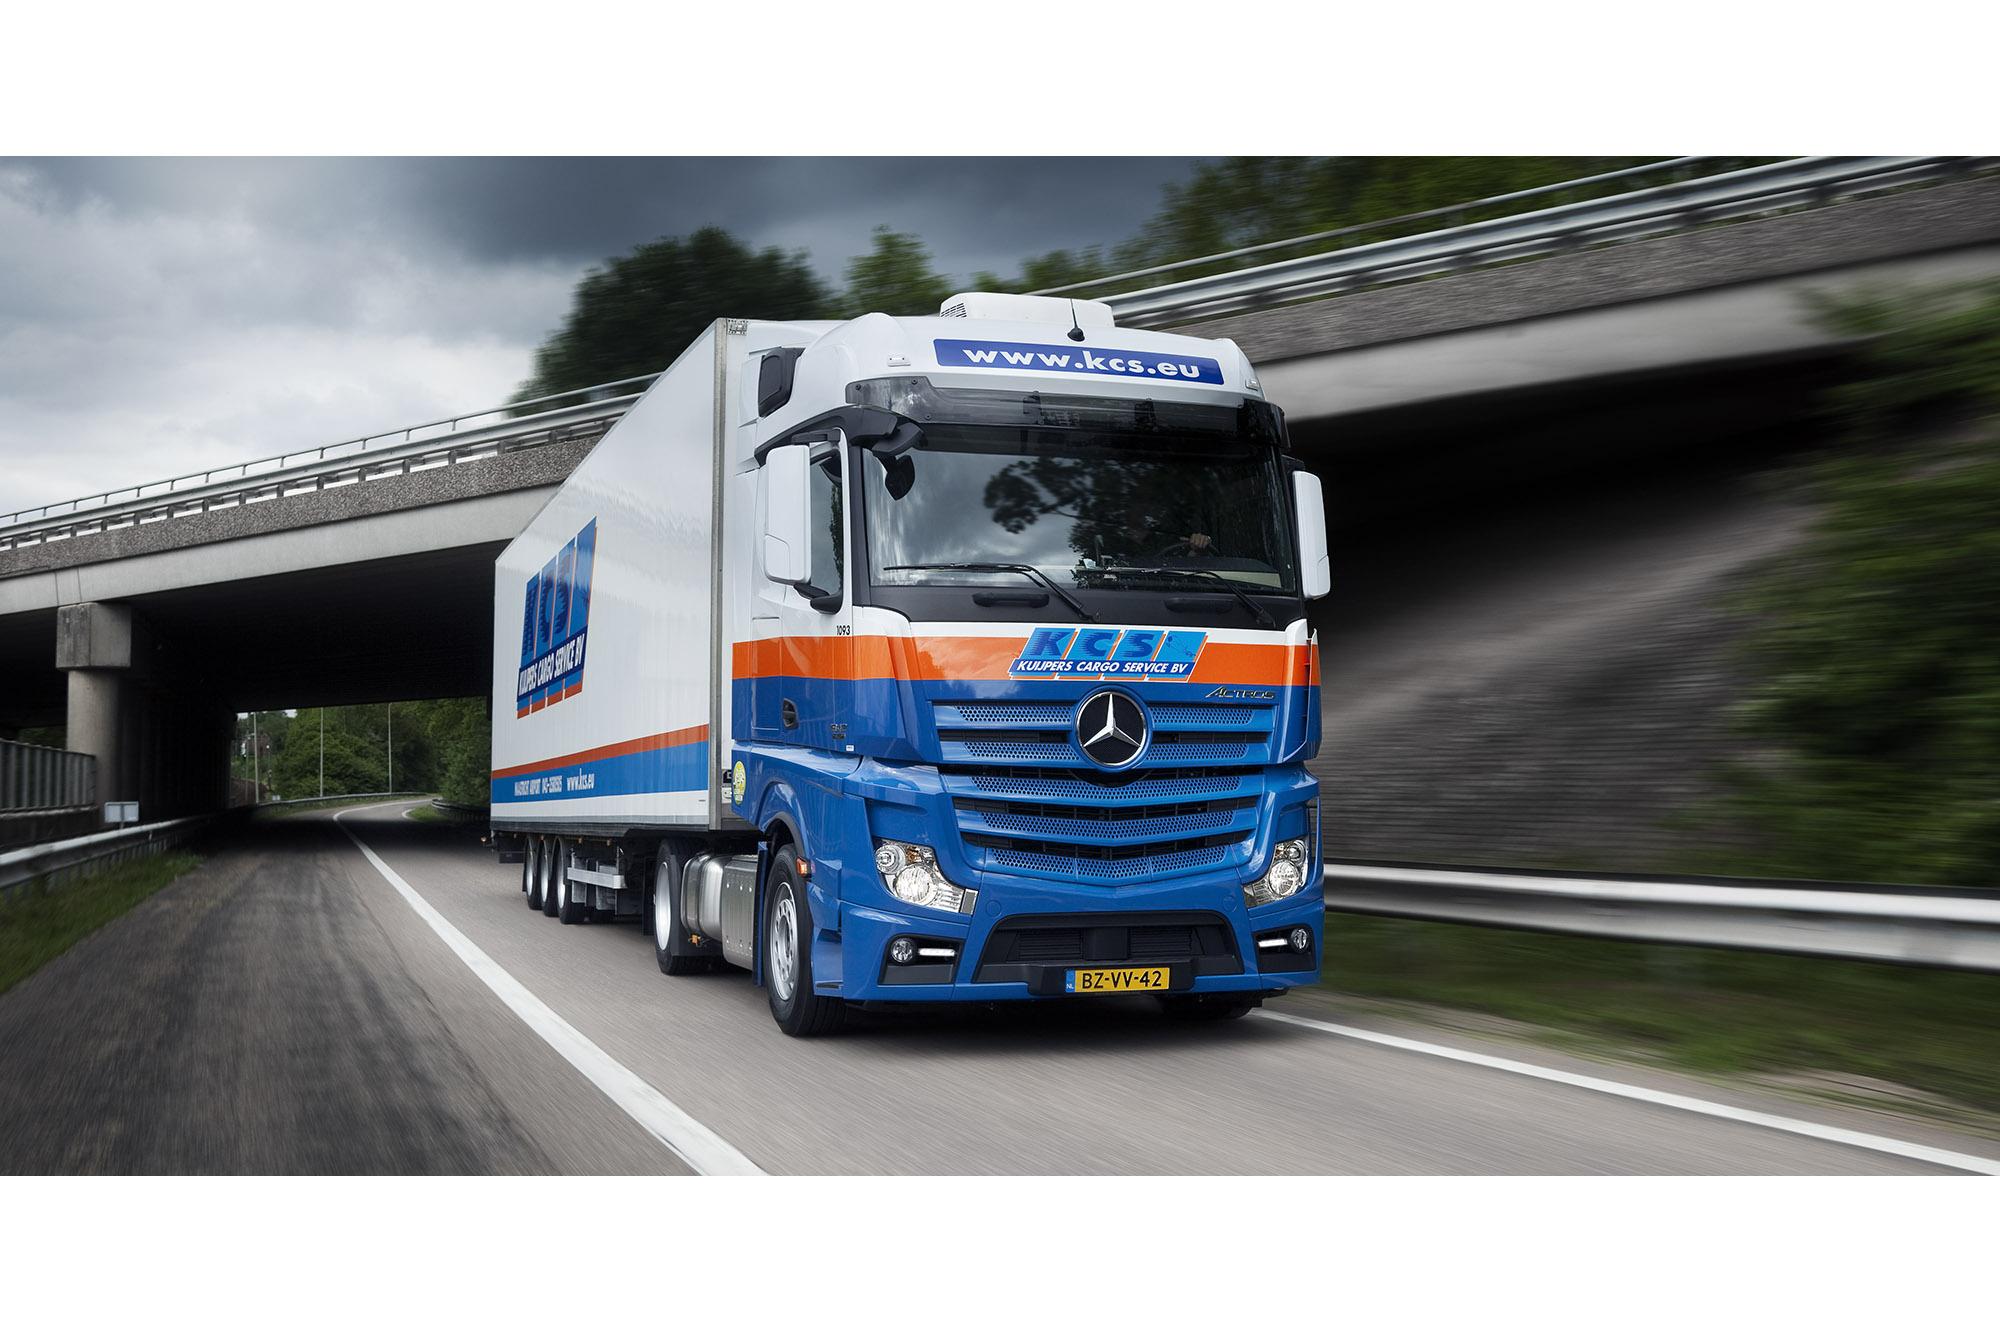 SPUISERS vrachtauto truck fotografie KCS mercedes Kuipers Cargo Service